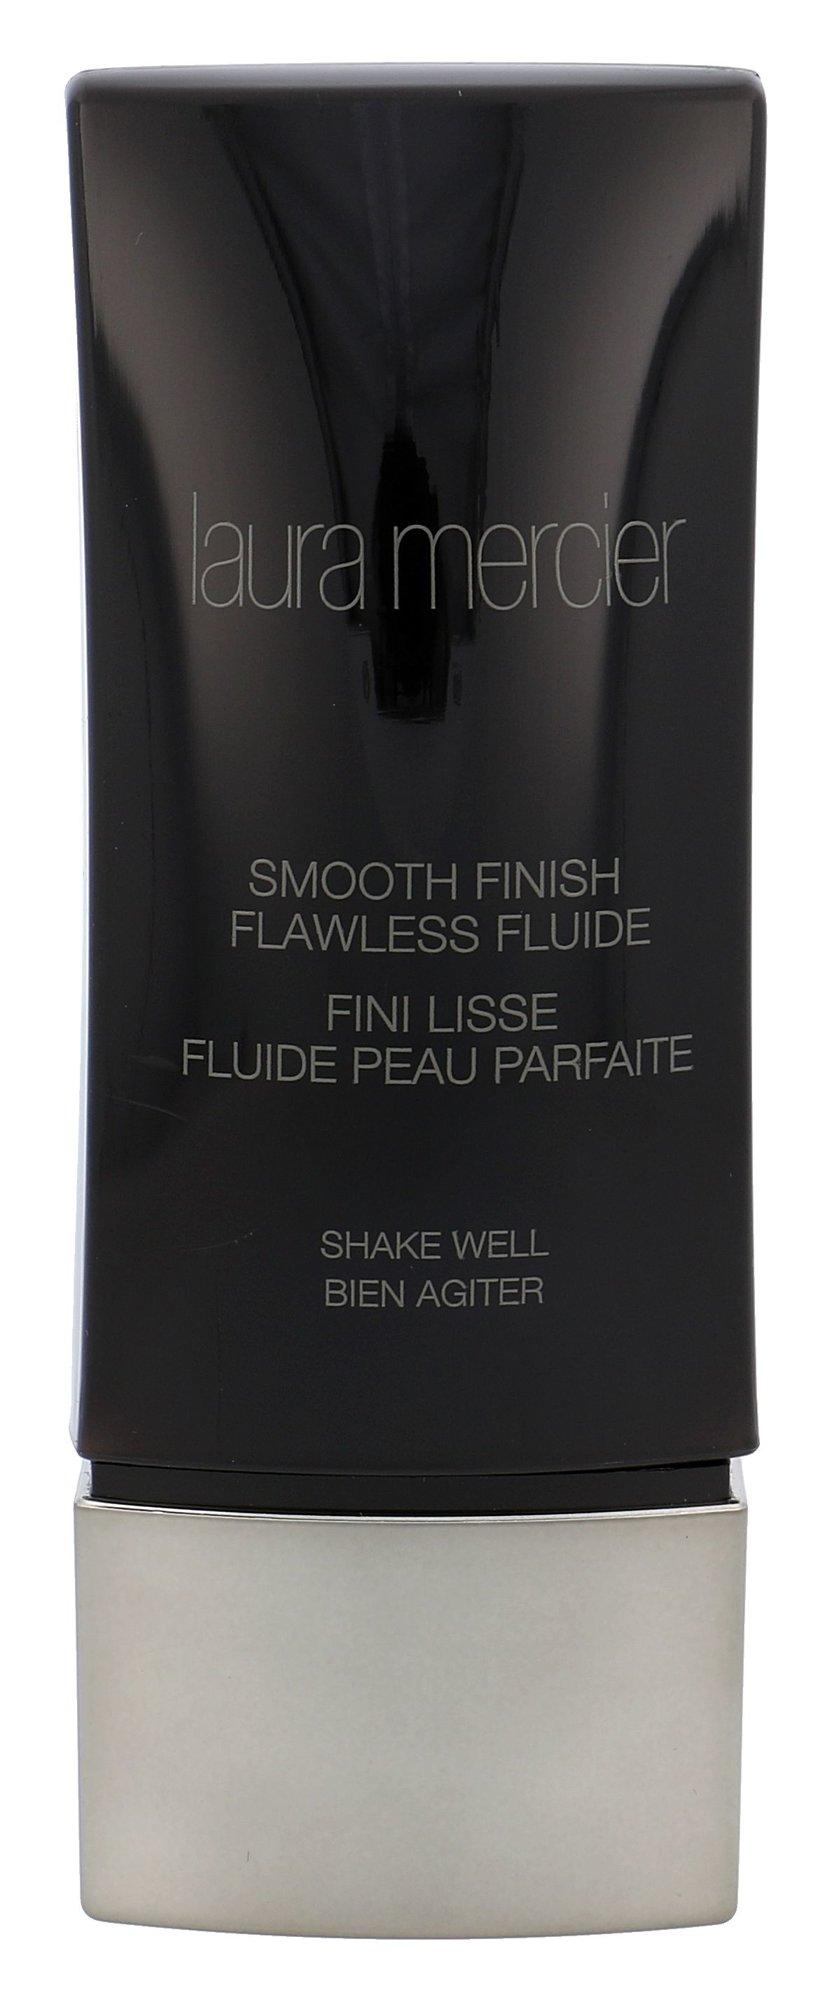 Laura Mercier Smooth Finish Flawless Fluide Cosmetic 30ml Ecru